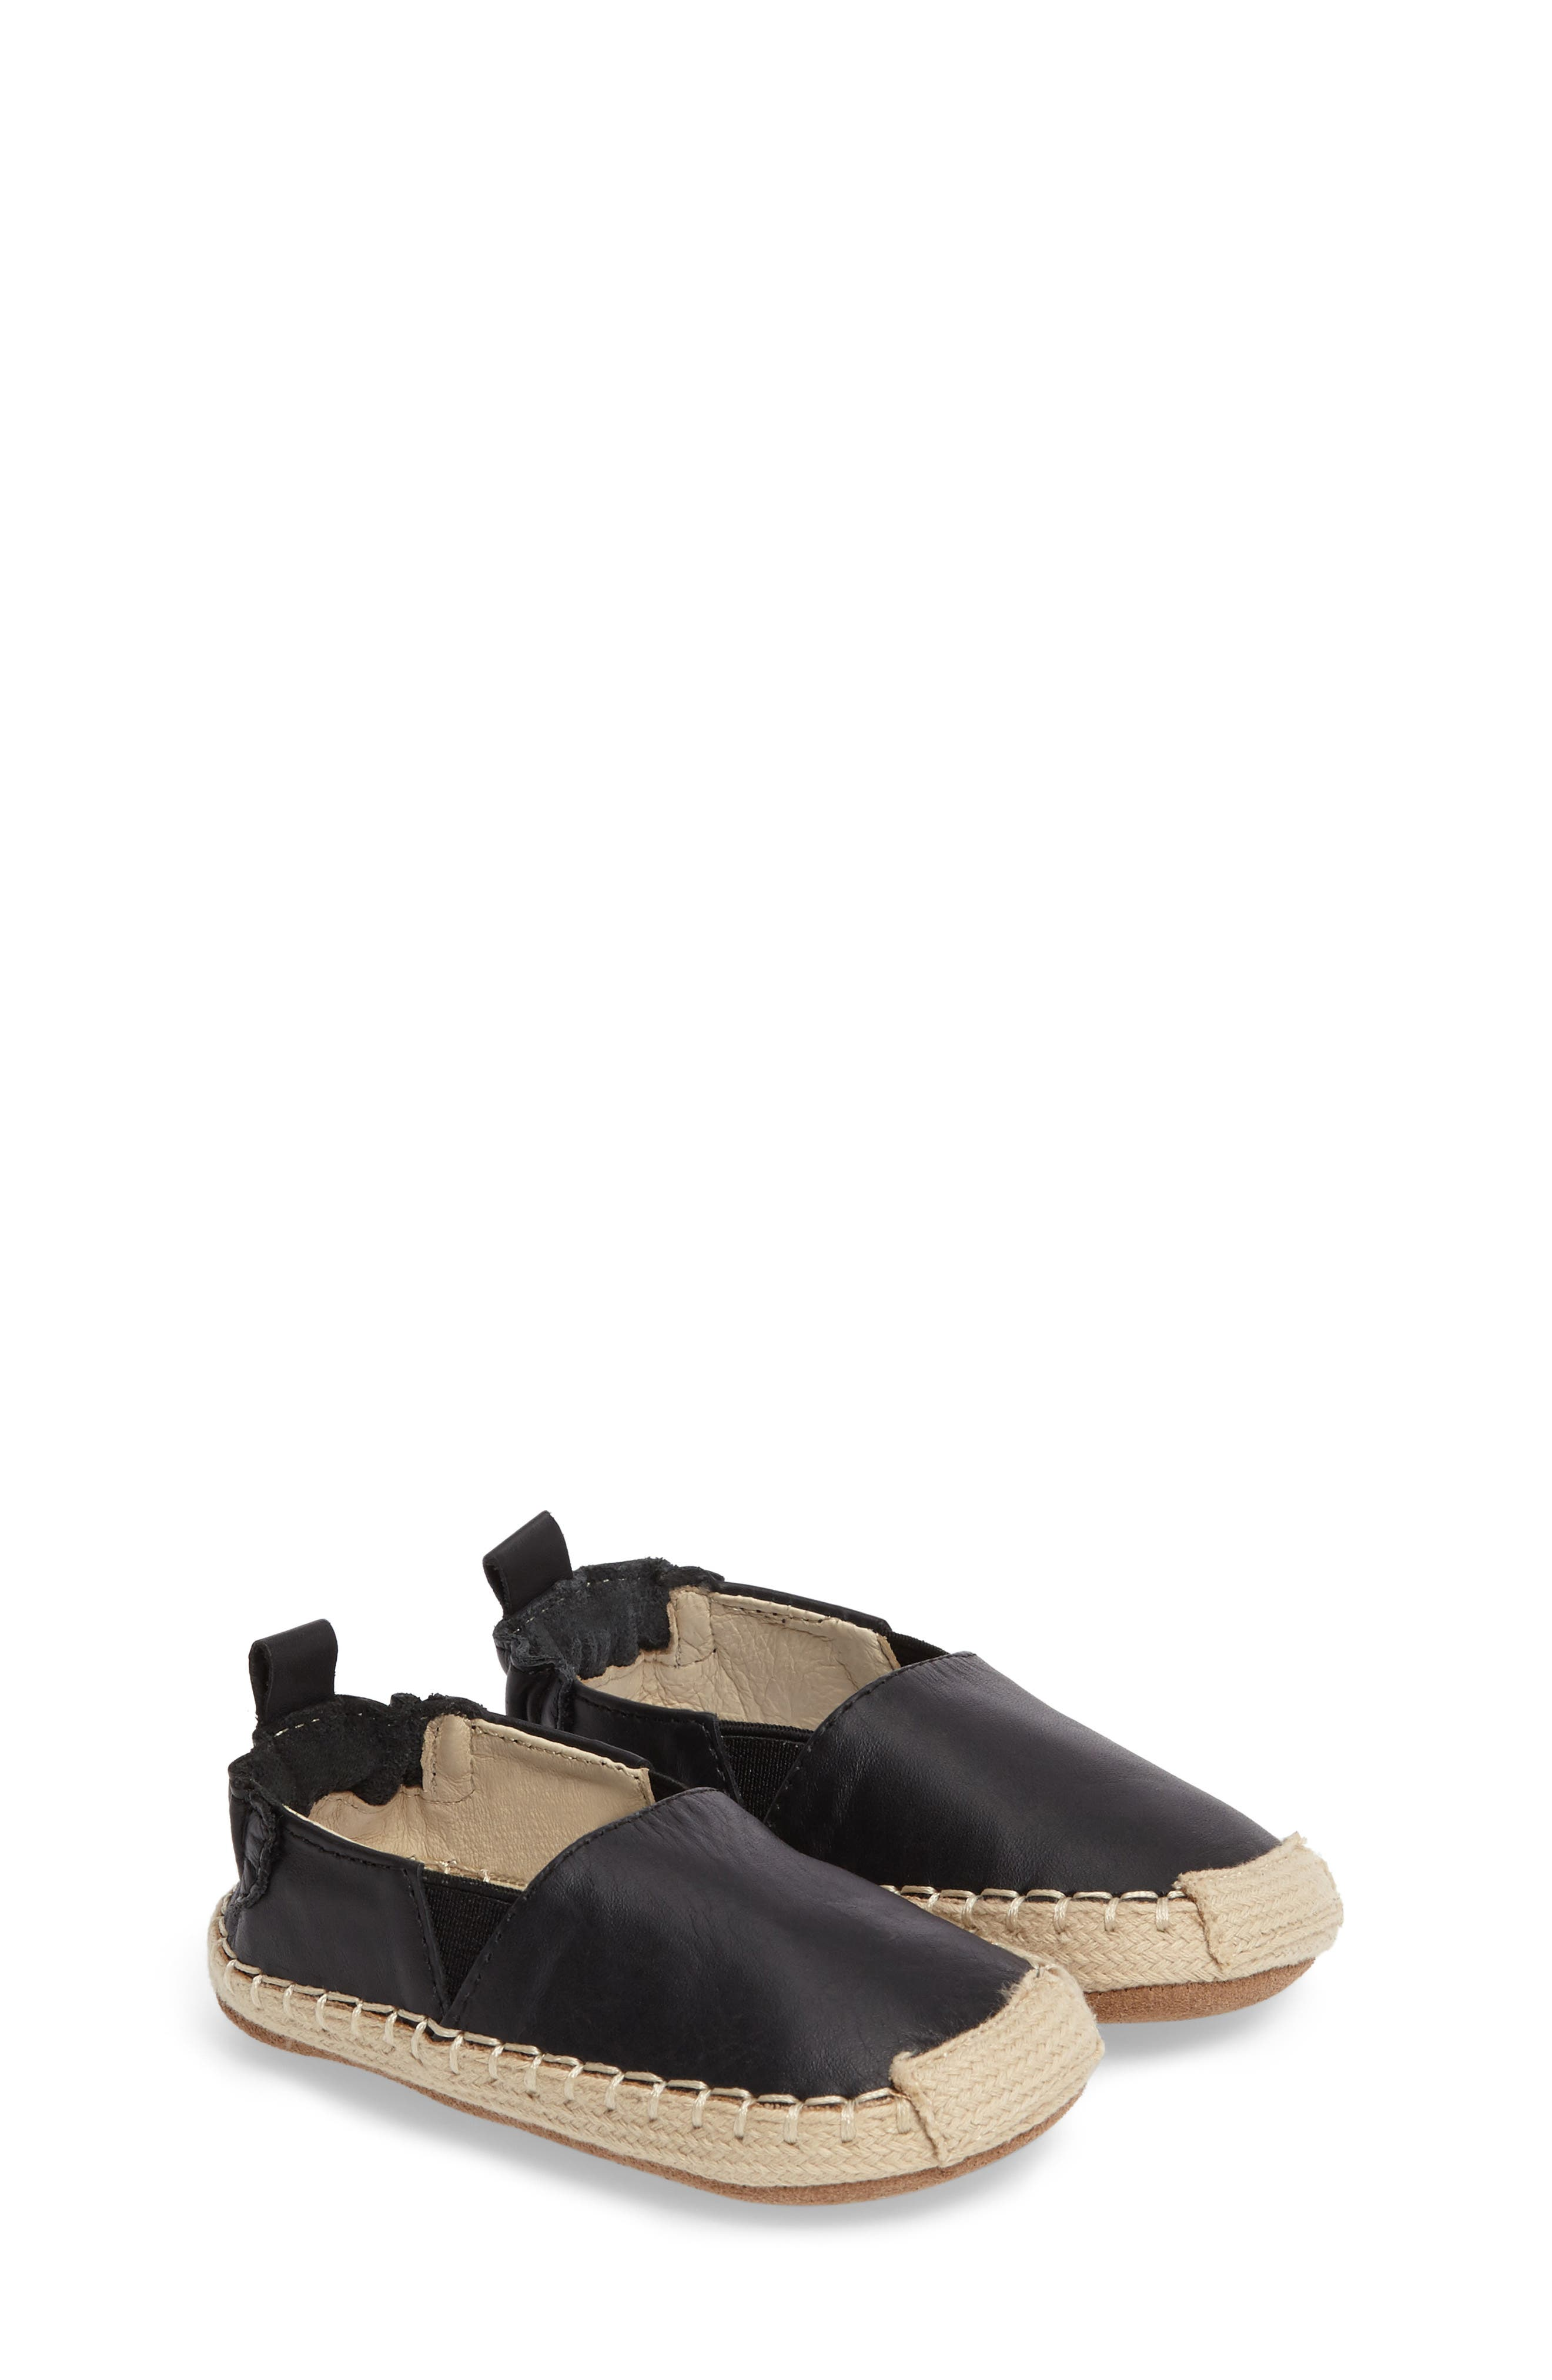 Ellie Crib Shoe,                         Main,                         color, Black Leather